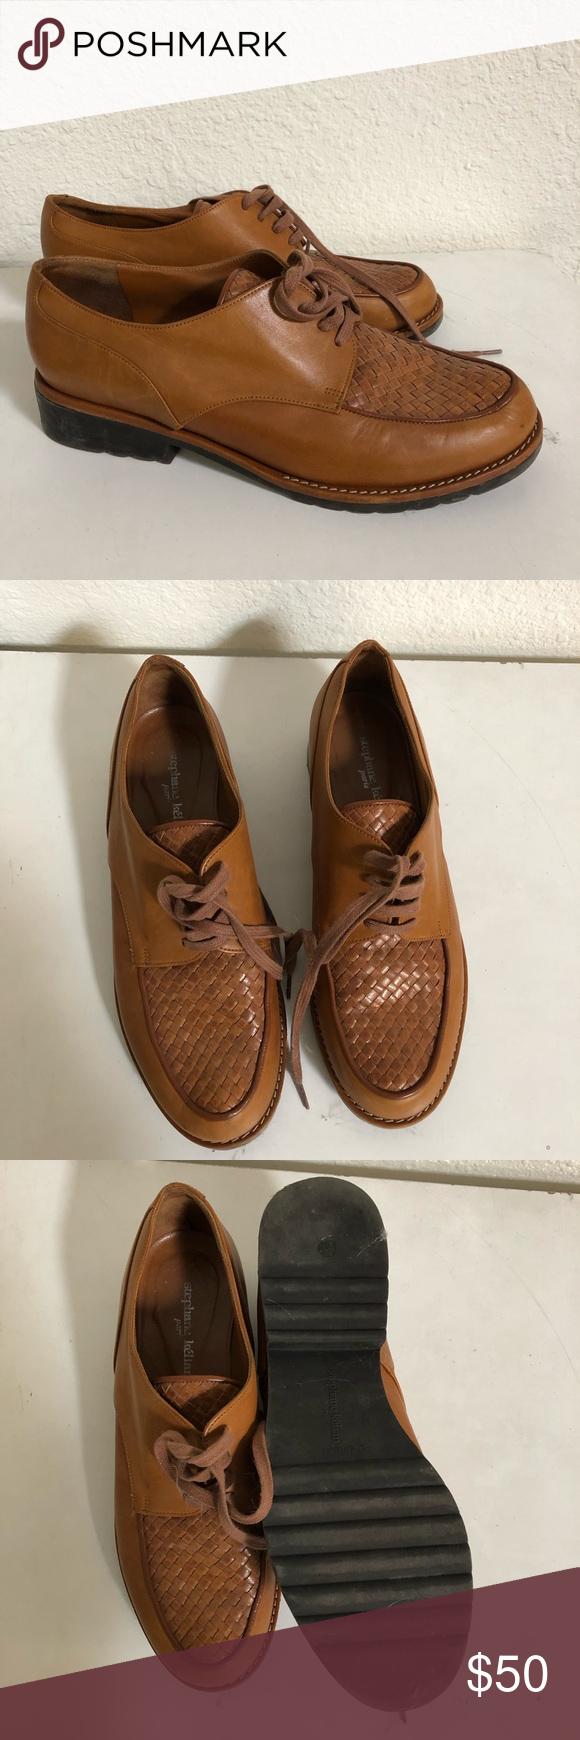 09b0639c0f3 Stephane Kelian lace up European Oxford shoes Stephane Kelian lace up shoes  Stephane Kelian Shoes Flats